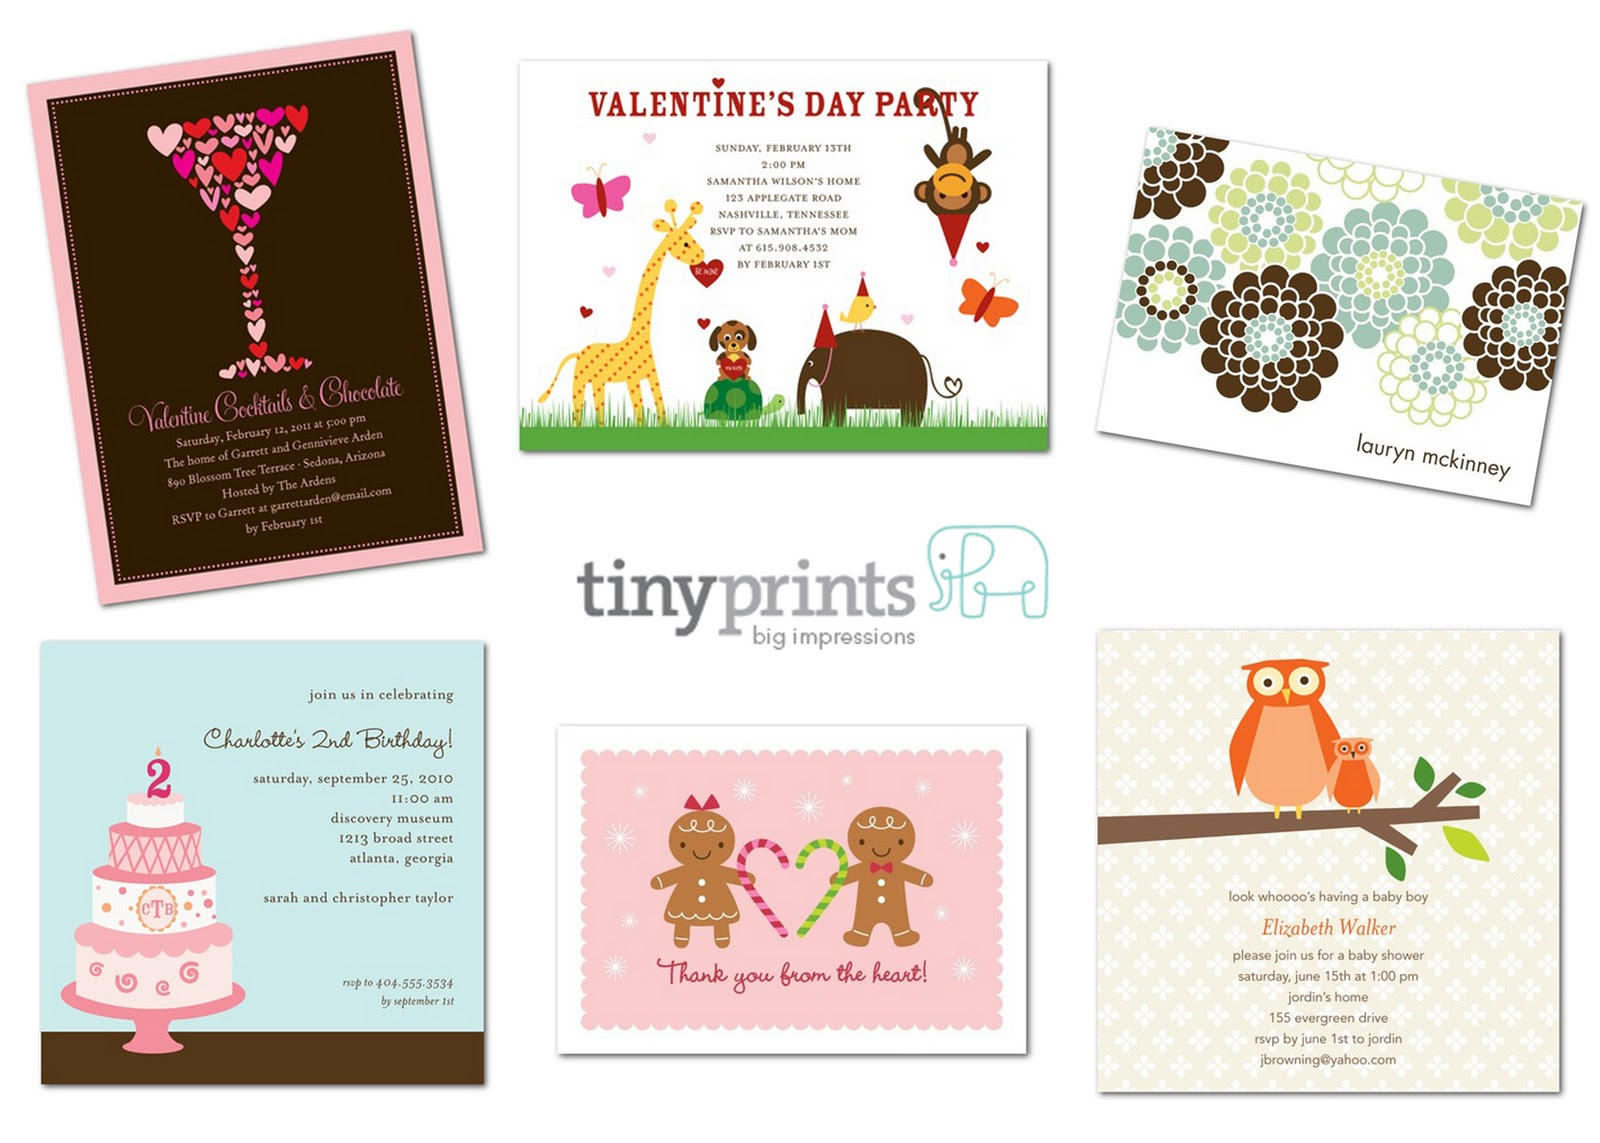 tiny prints giveaway glorious treats